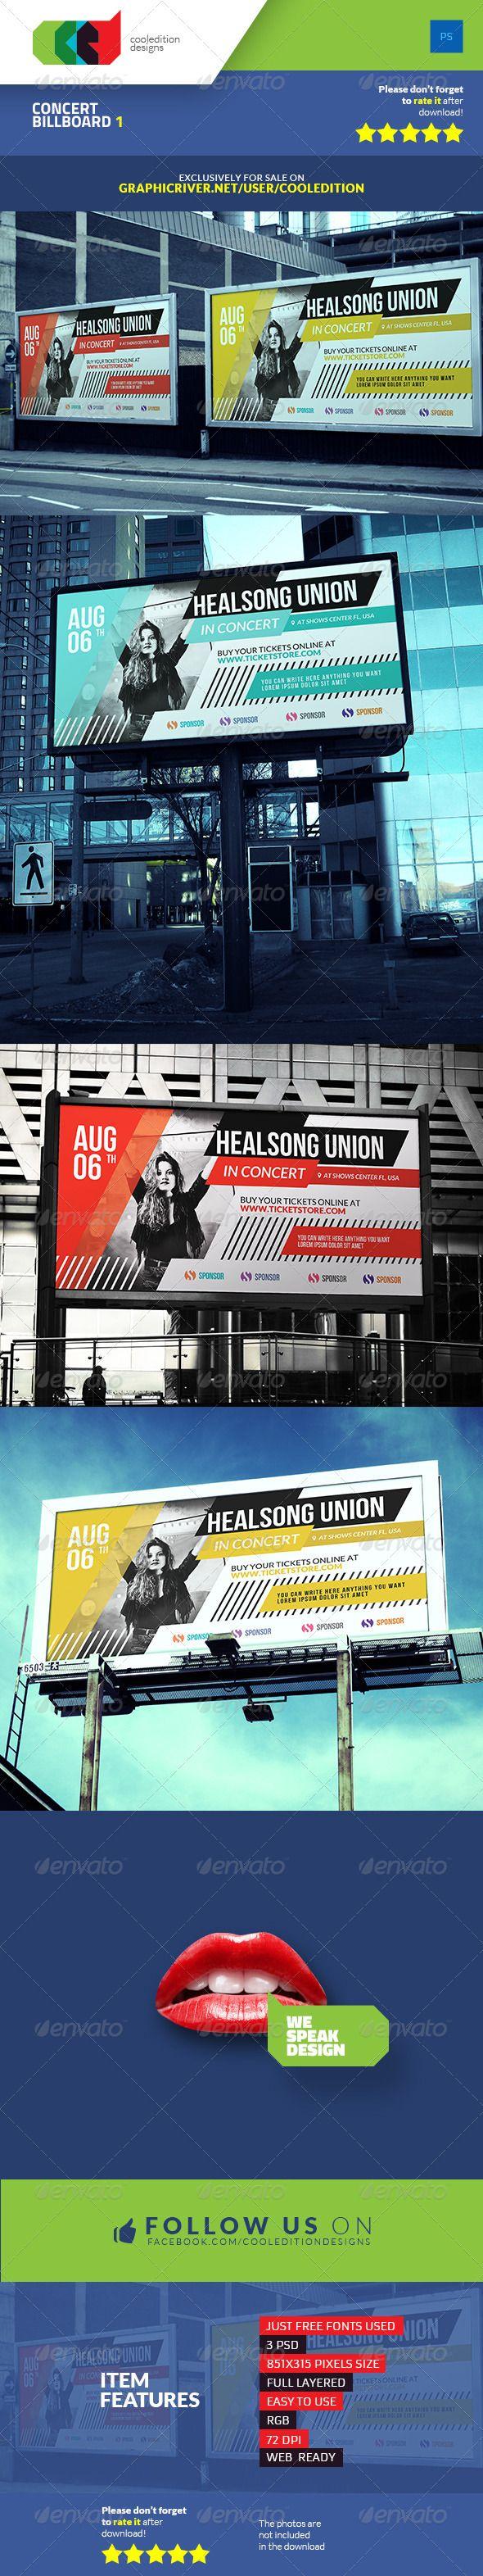 Concert Billboard Template #design Download: http://graphicriver.net/item/concert-billboard-1/7428195?ref=ksioks